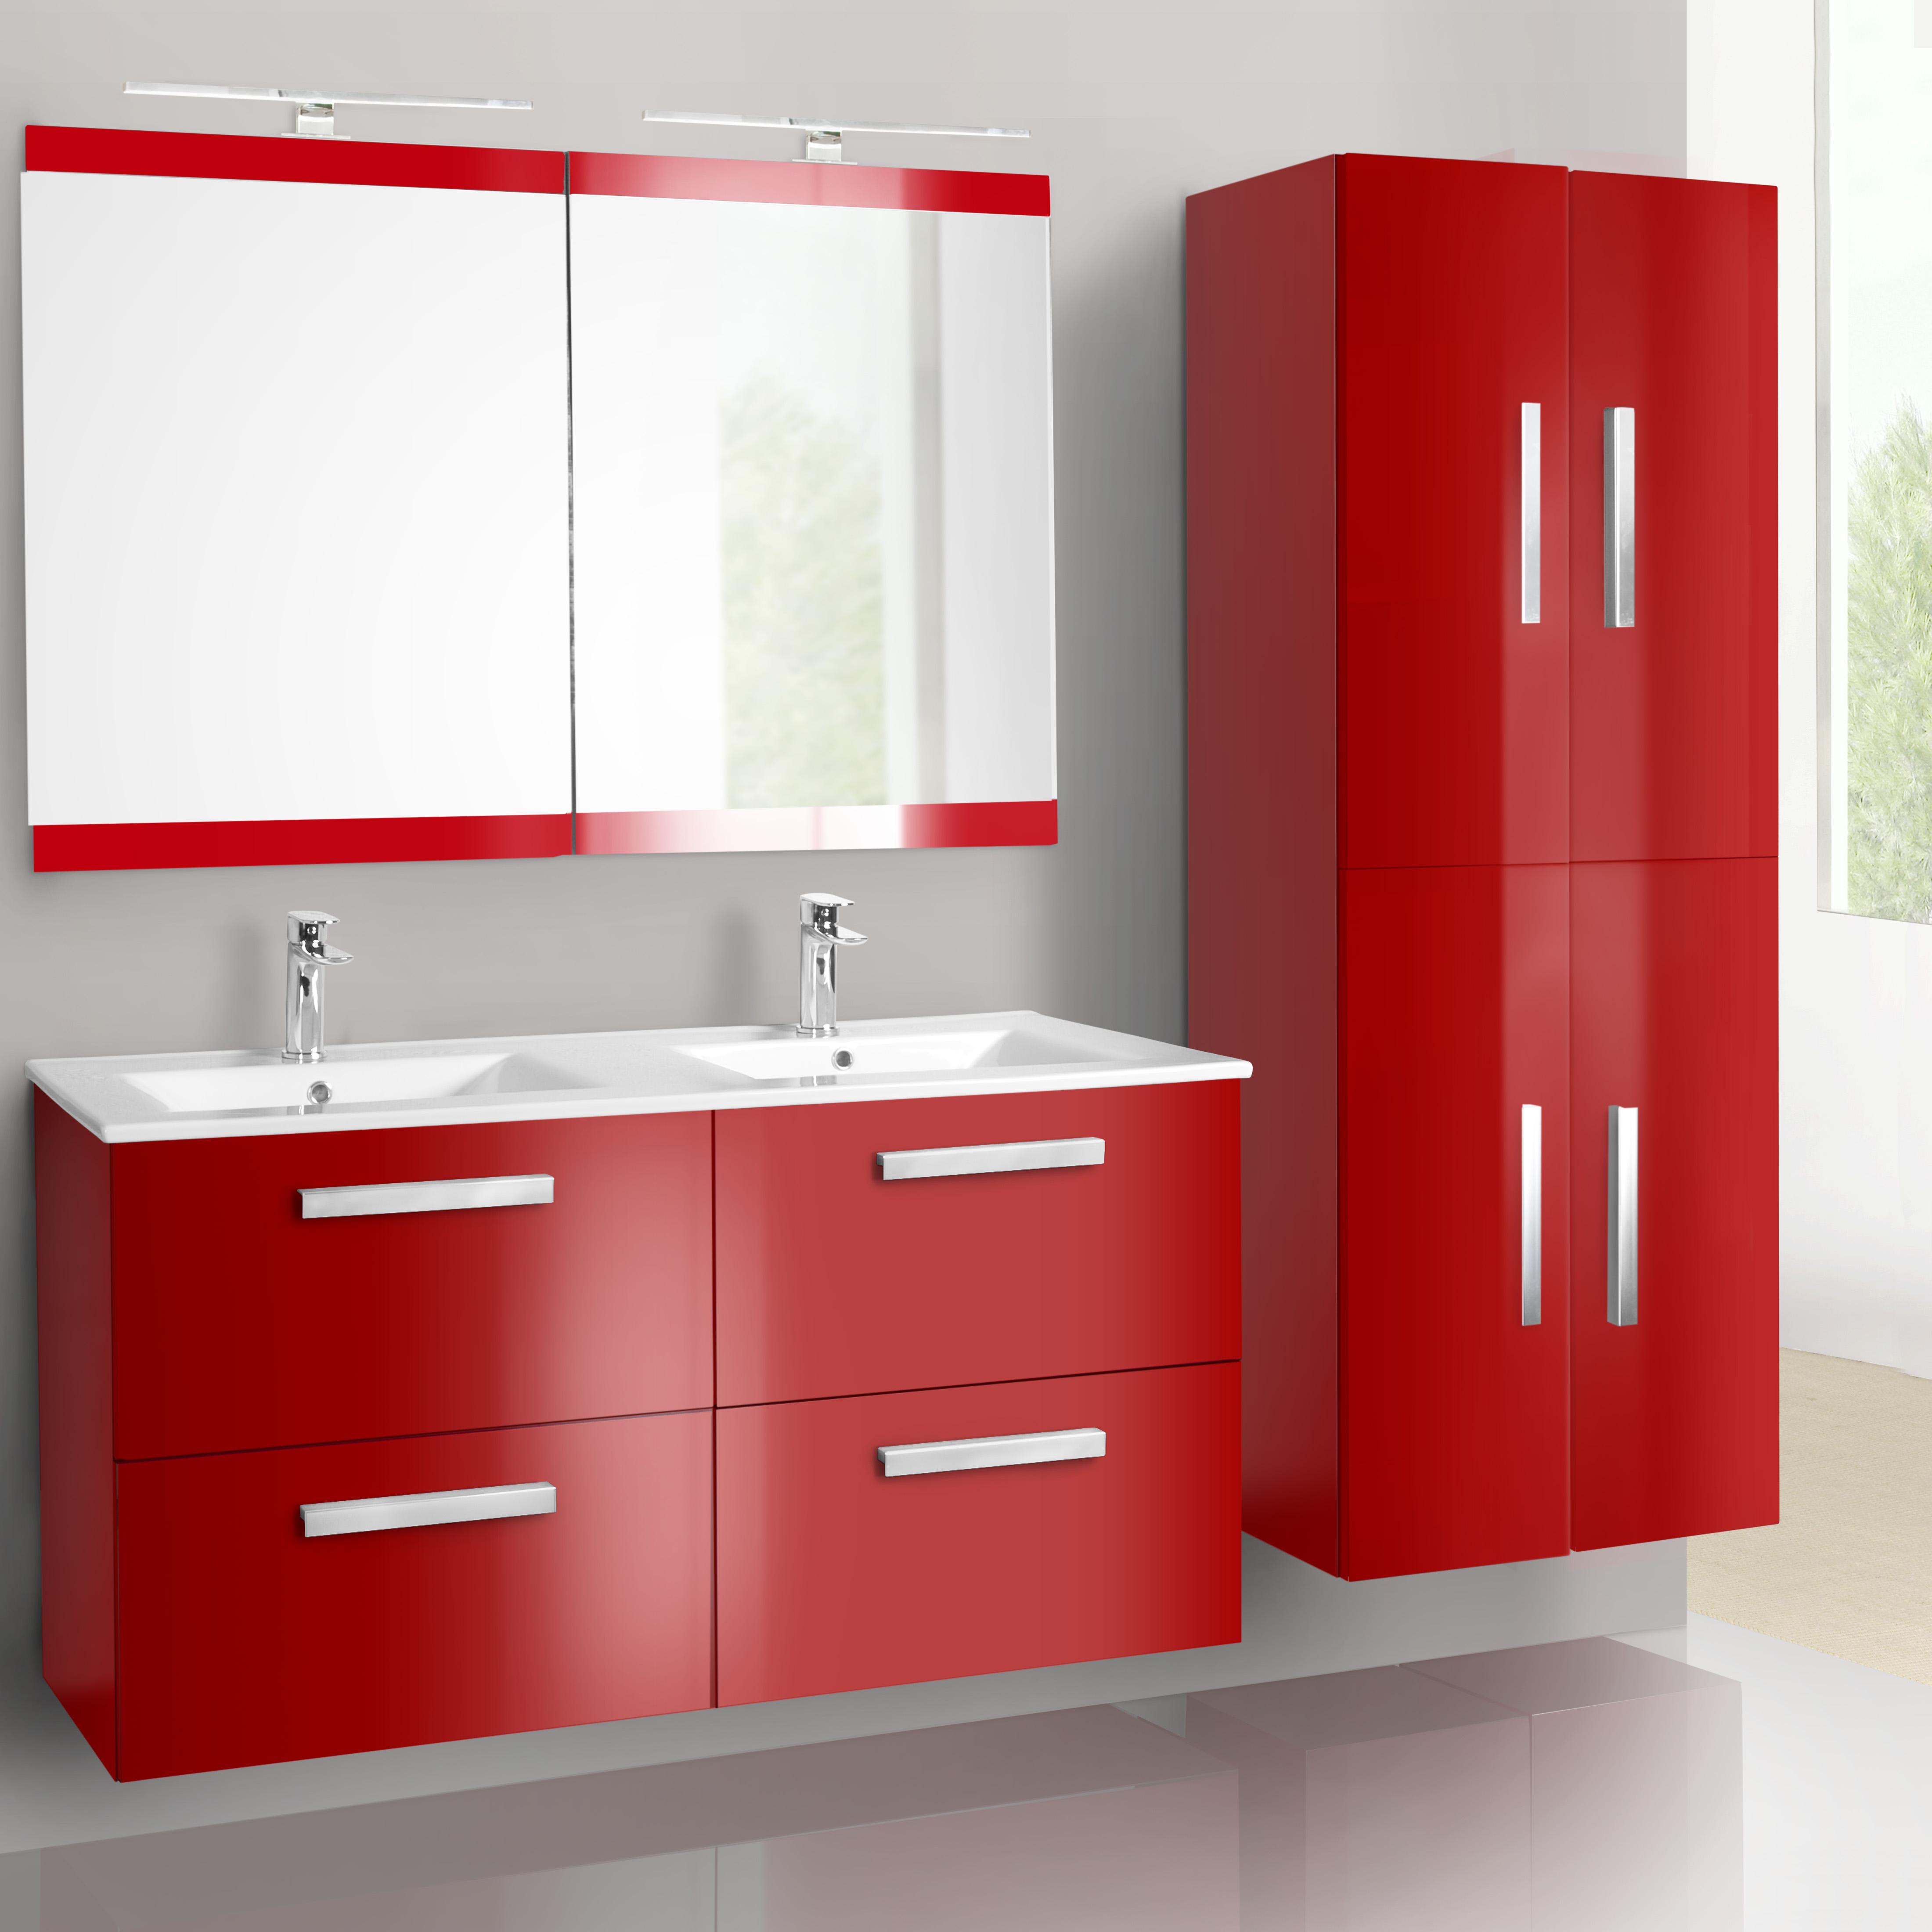 Muebles Para Baño Ferrari:Modelo Plus 120